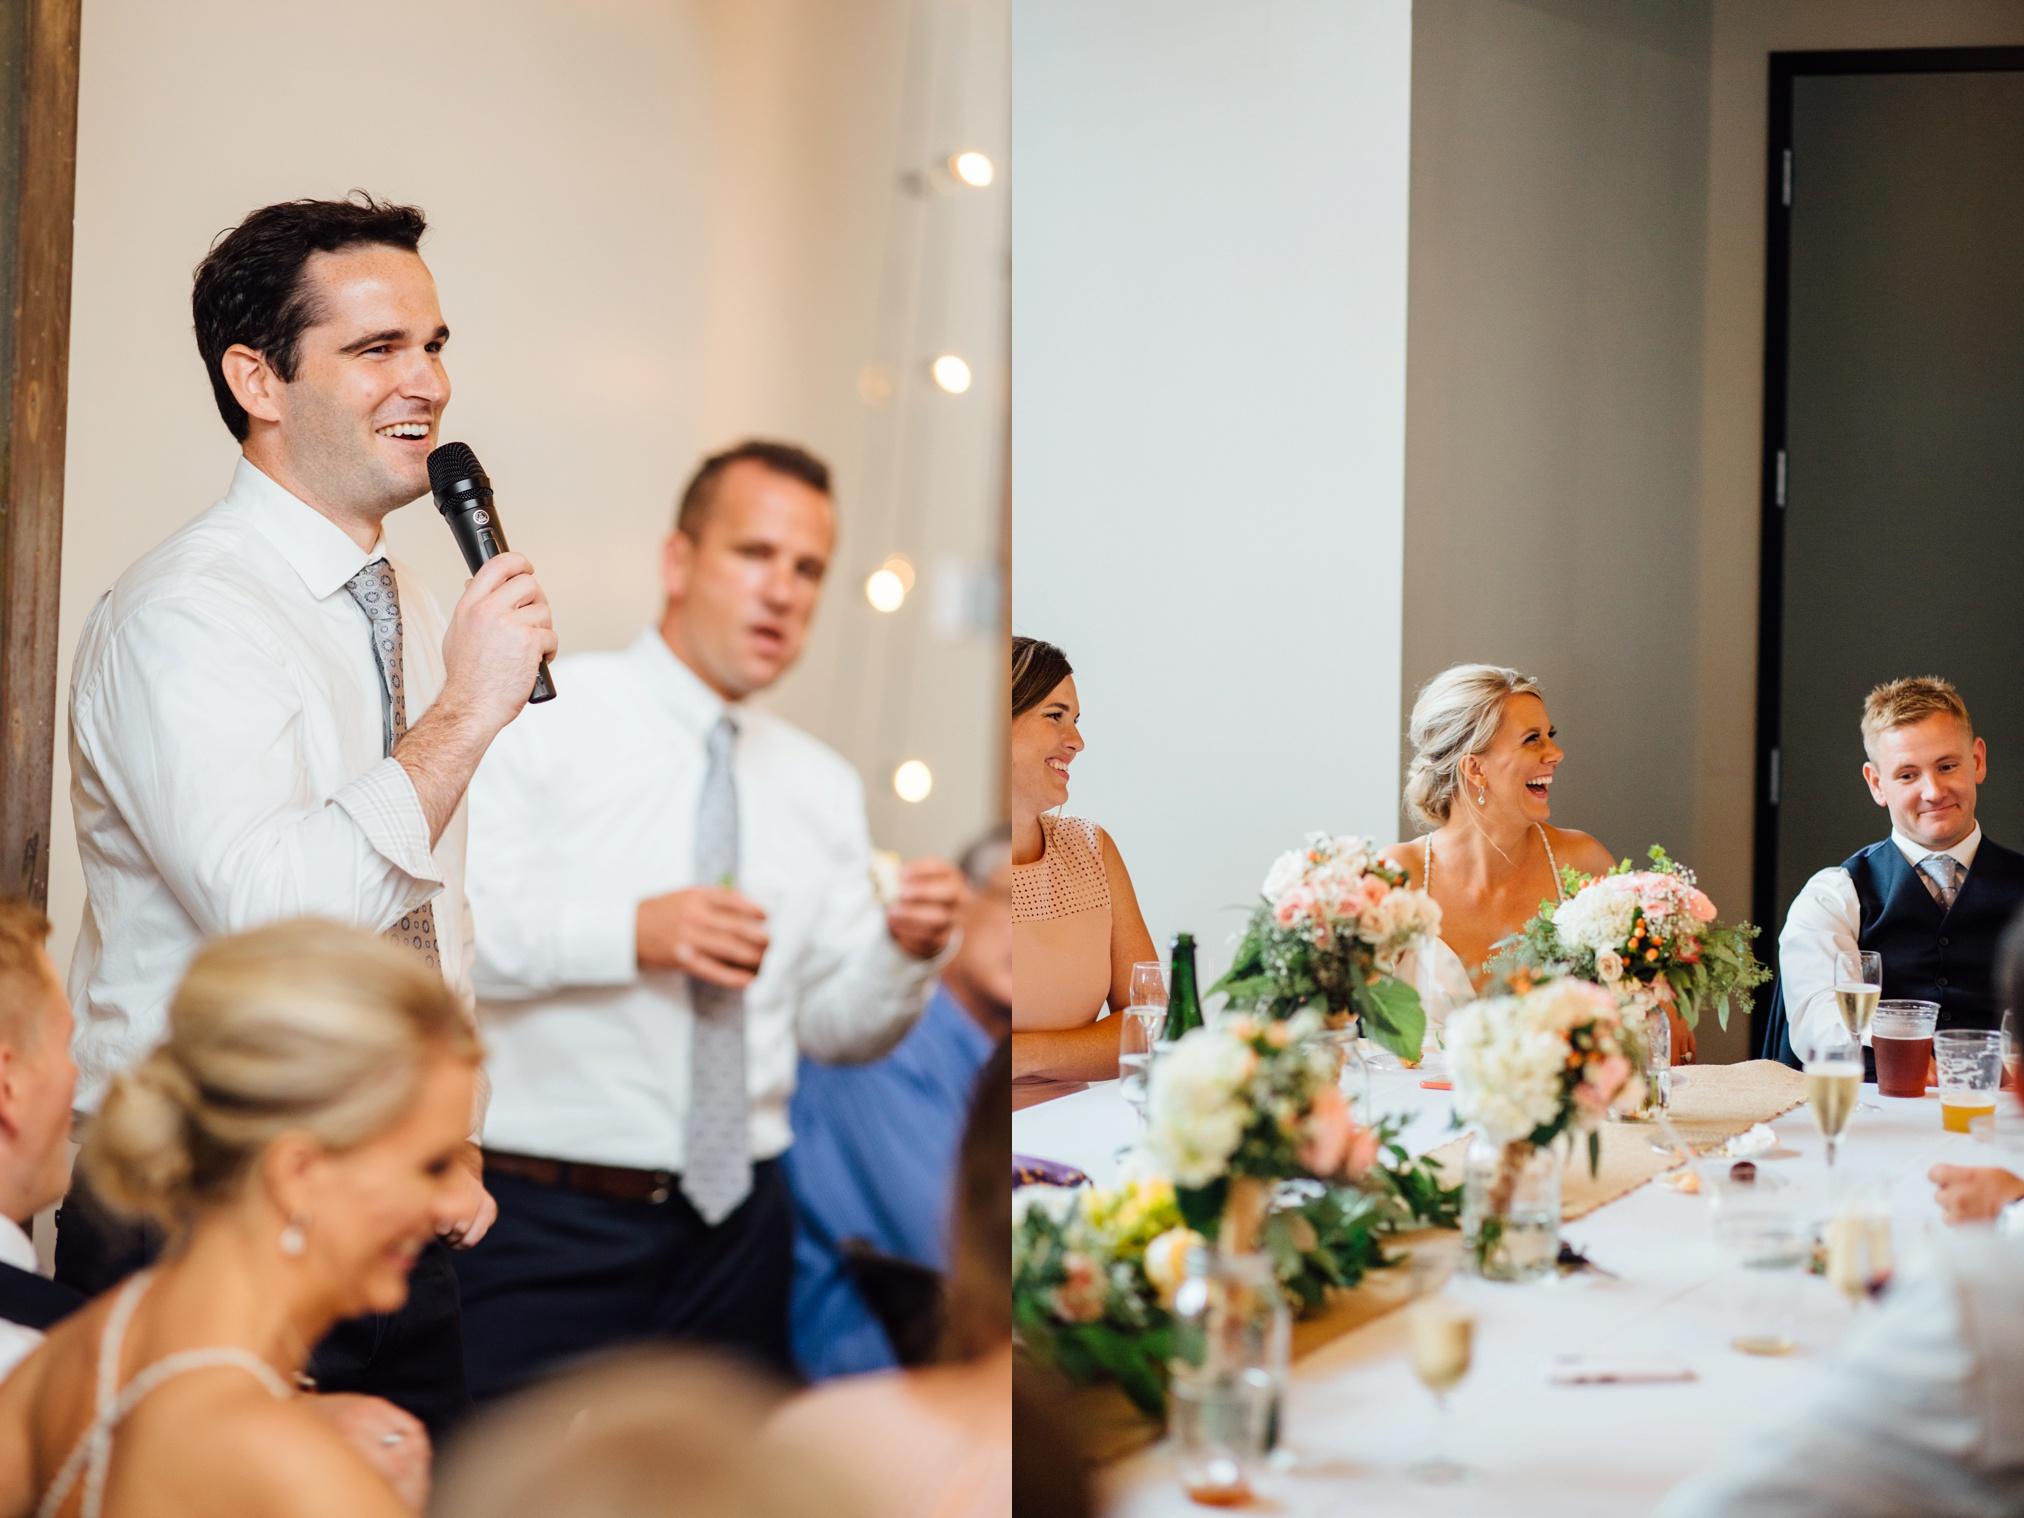 brenna+michael_wedding-585.jpg